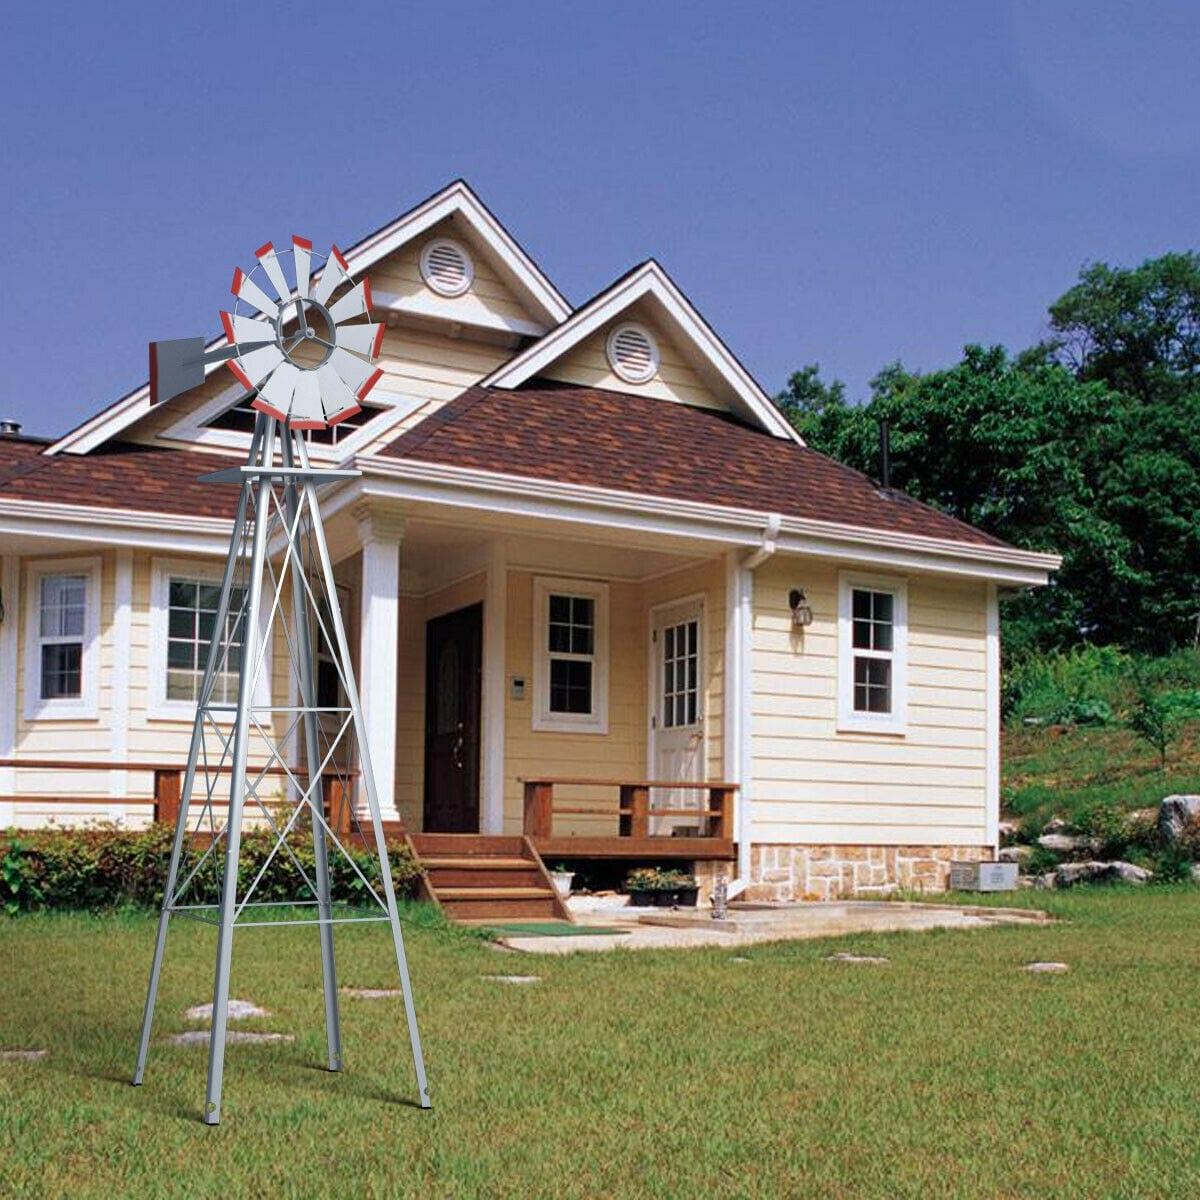 9ft Ornamental Decorative Decor Outdoor Garden Yard Wood Windmill Weather Vane